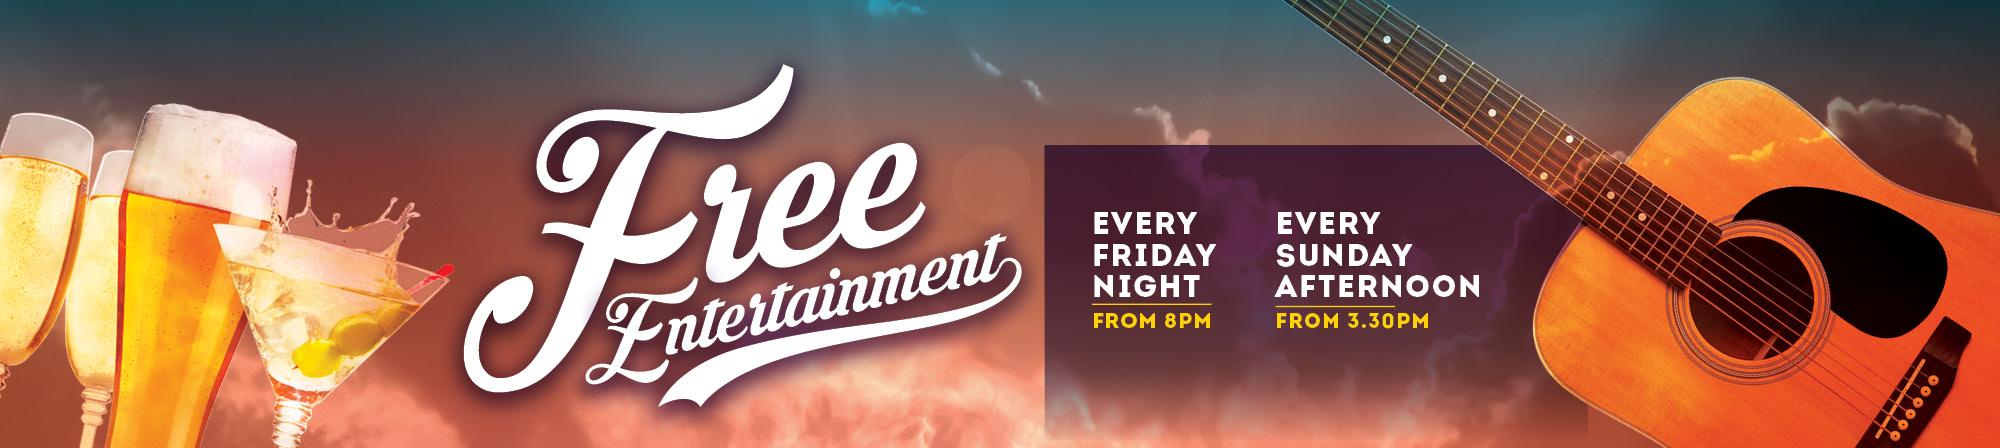 Free-Entertainment-Generic-Web-slider-